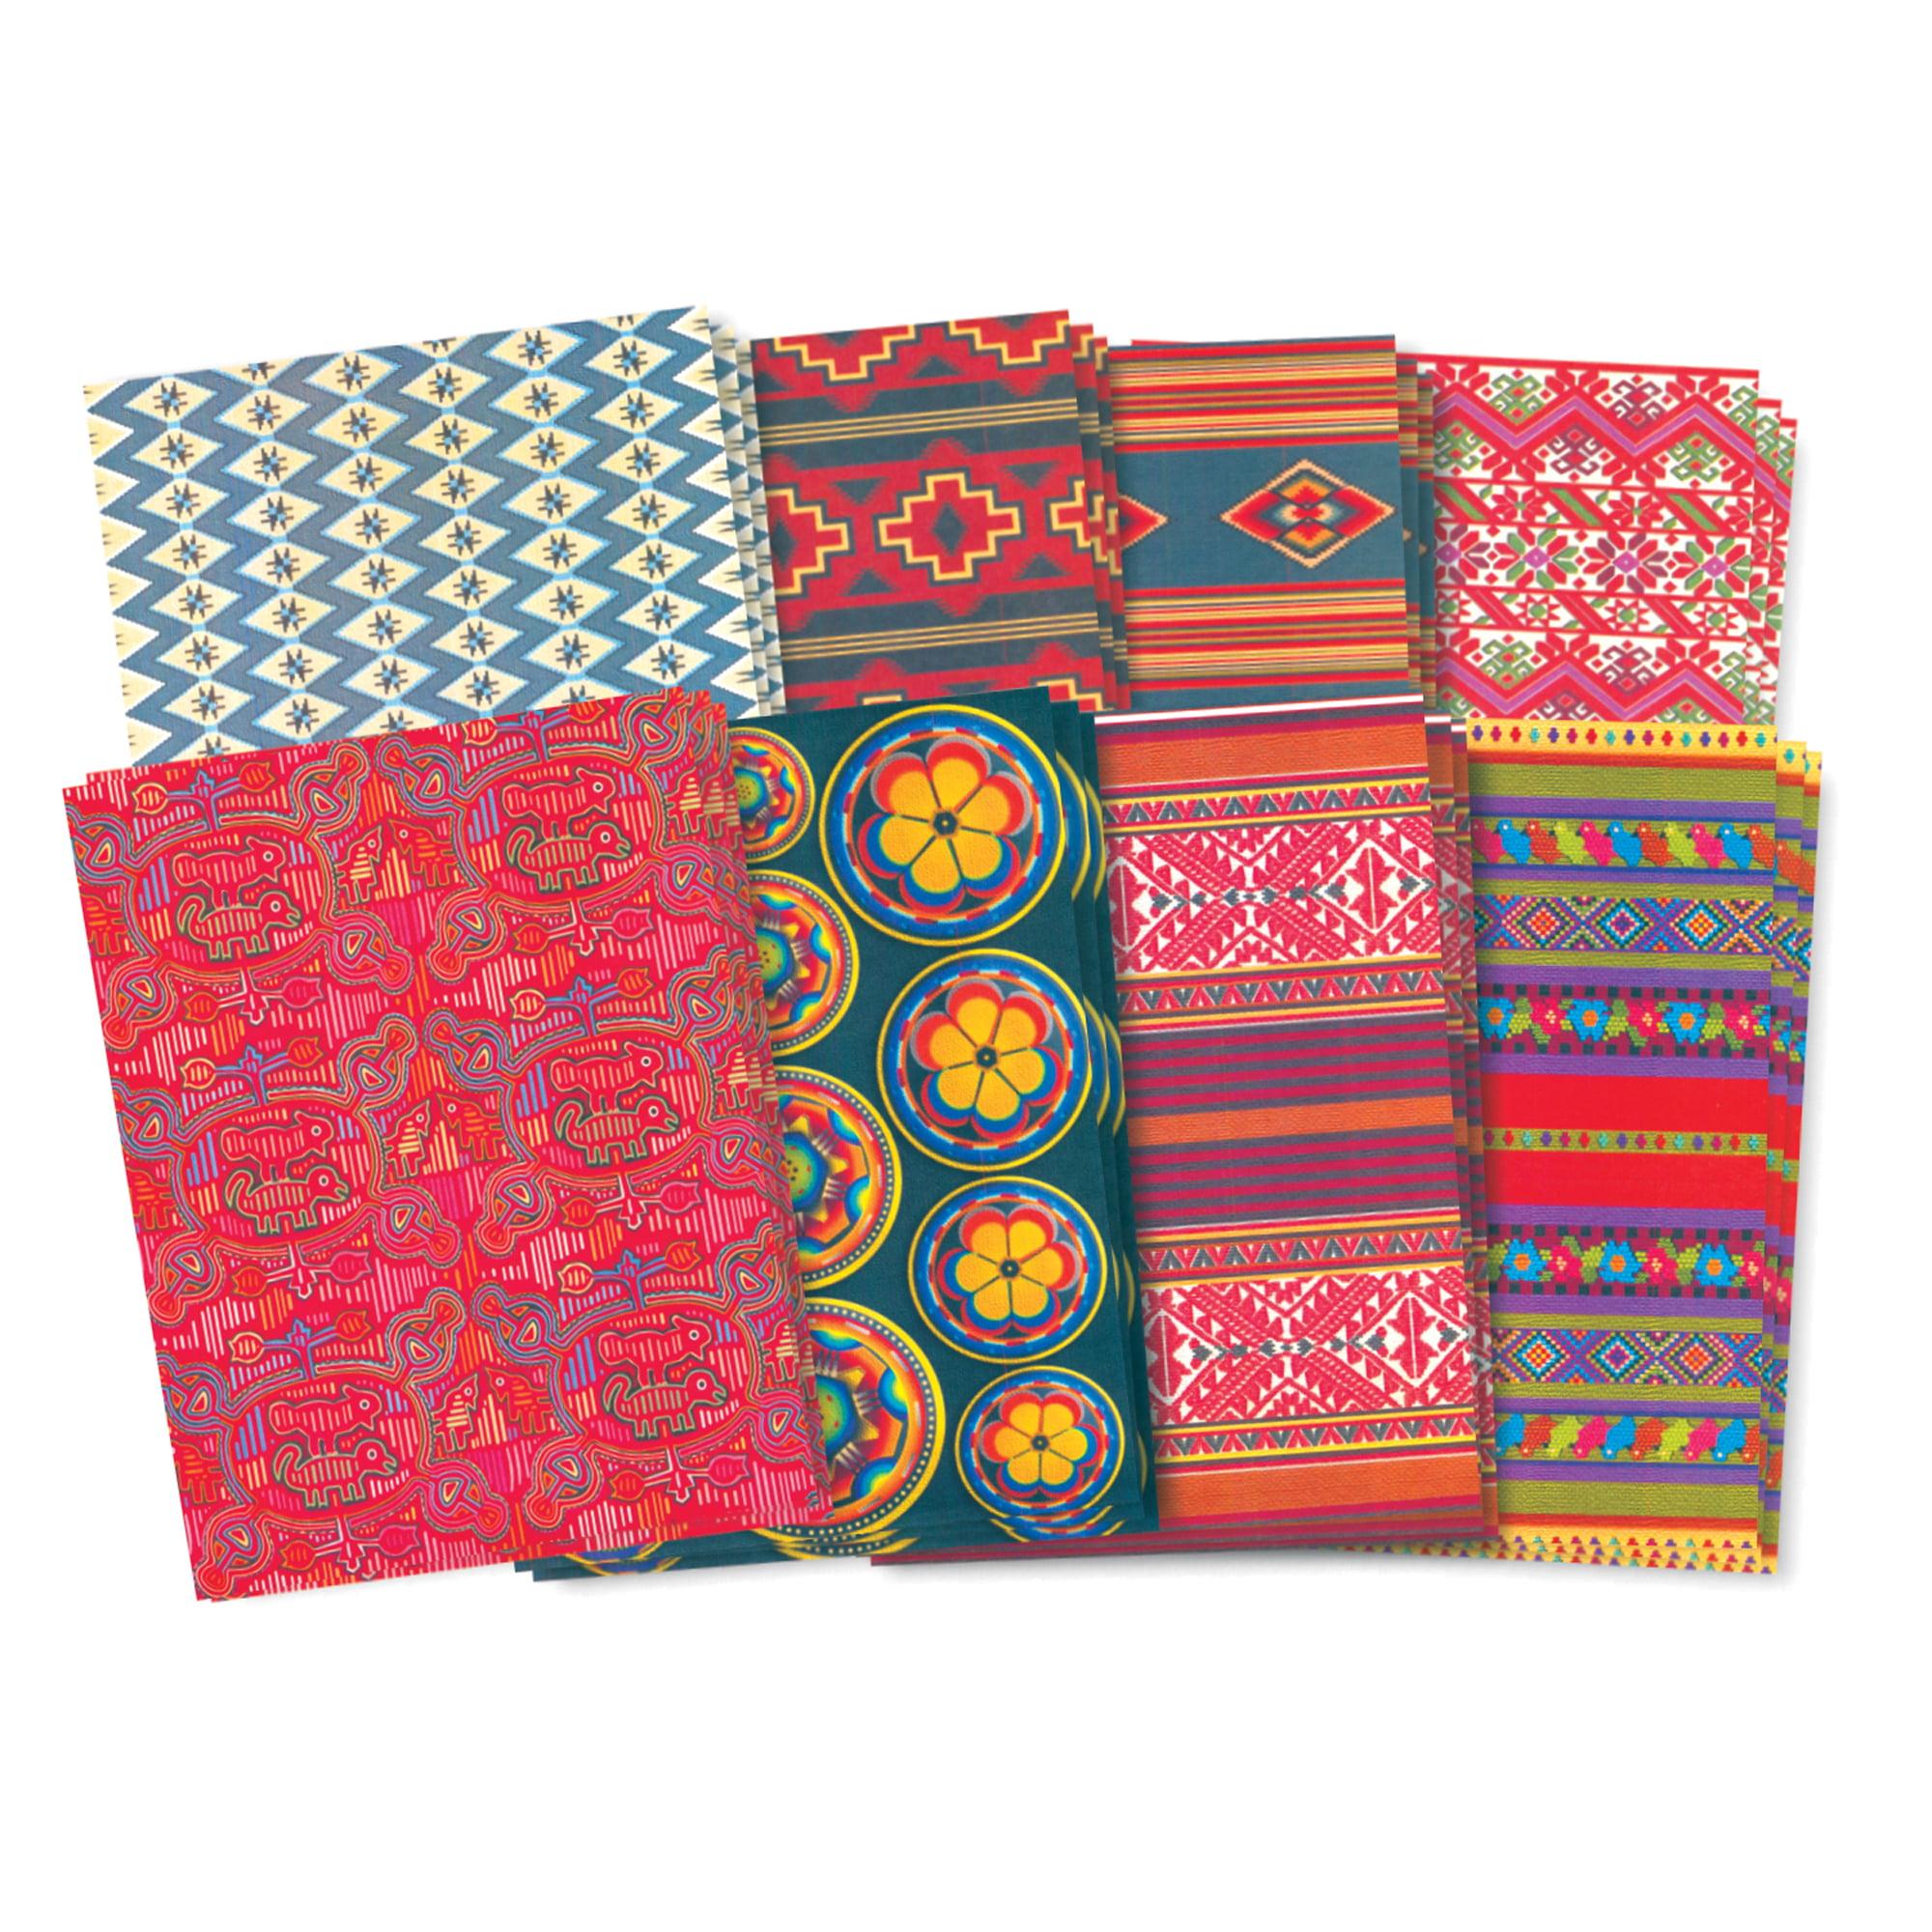 Roylco® Hispanic Paper, 32 sheets/pkg, Set of 3 packs